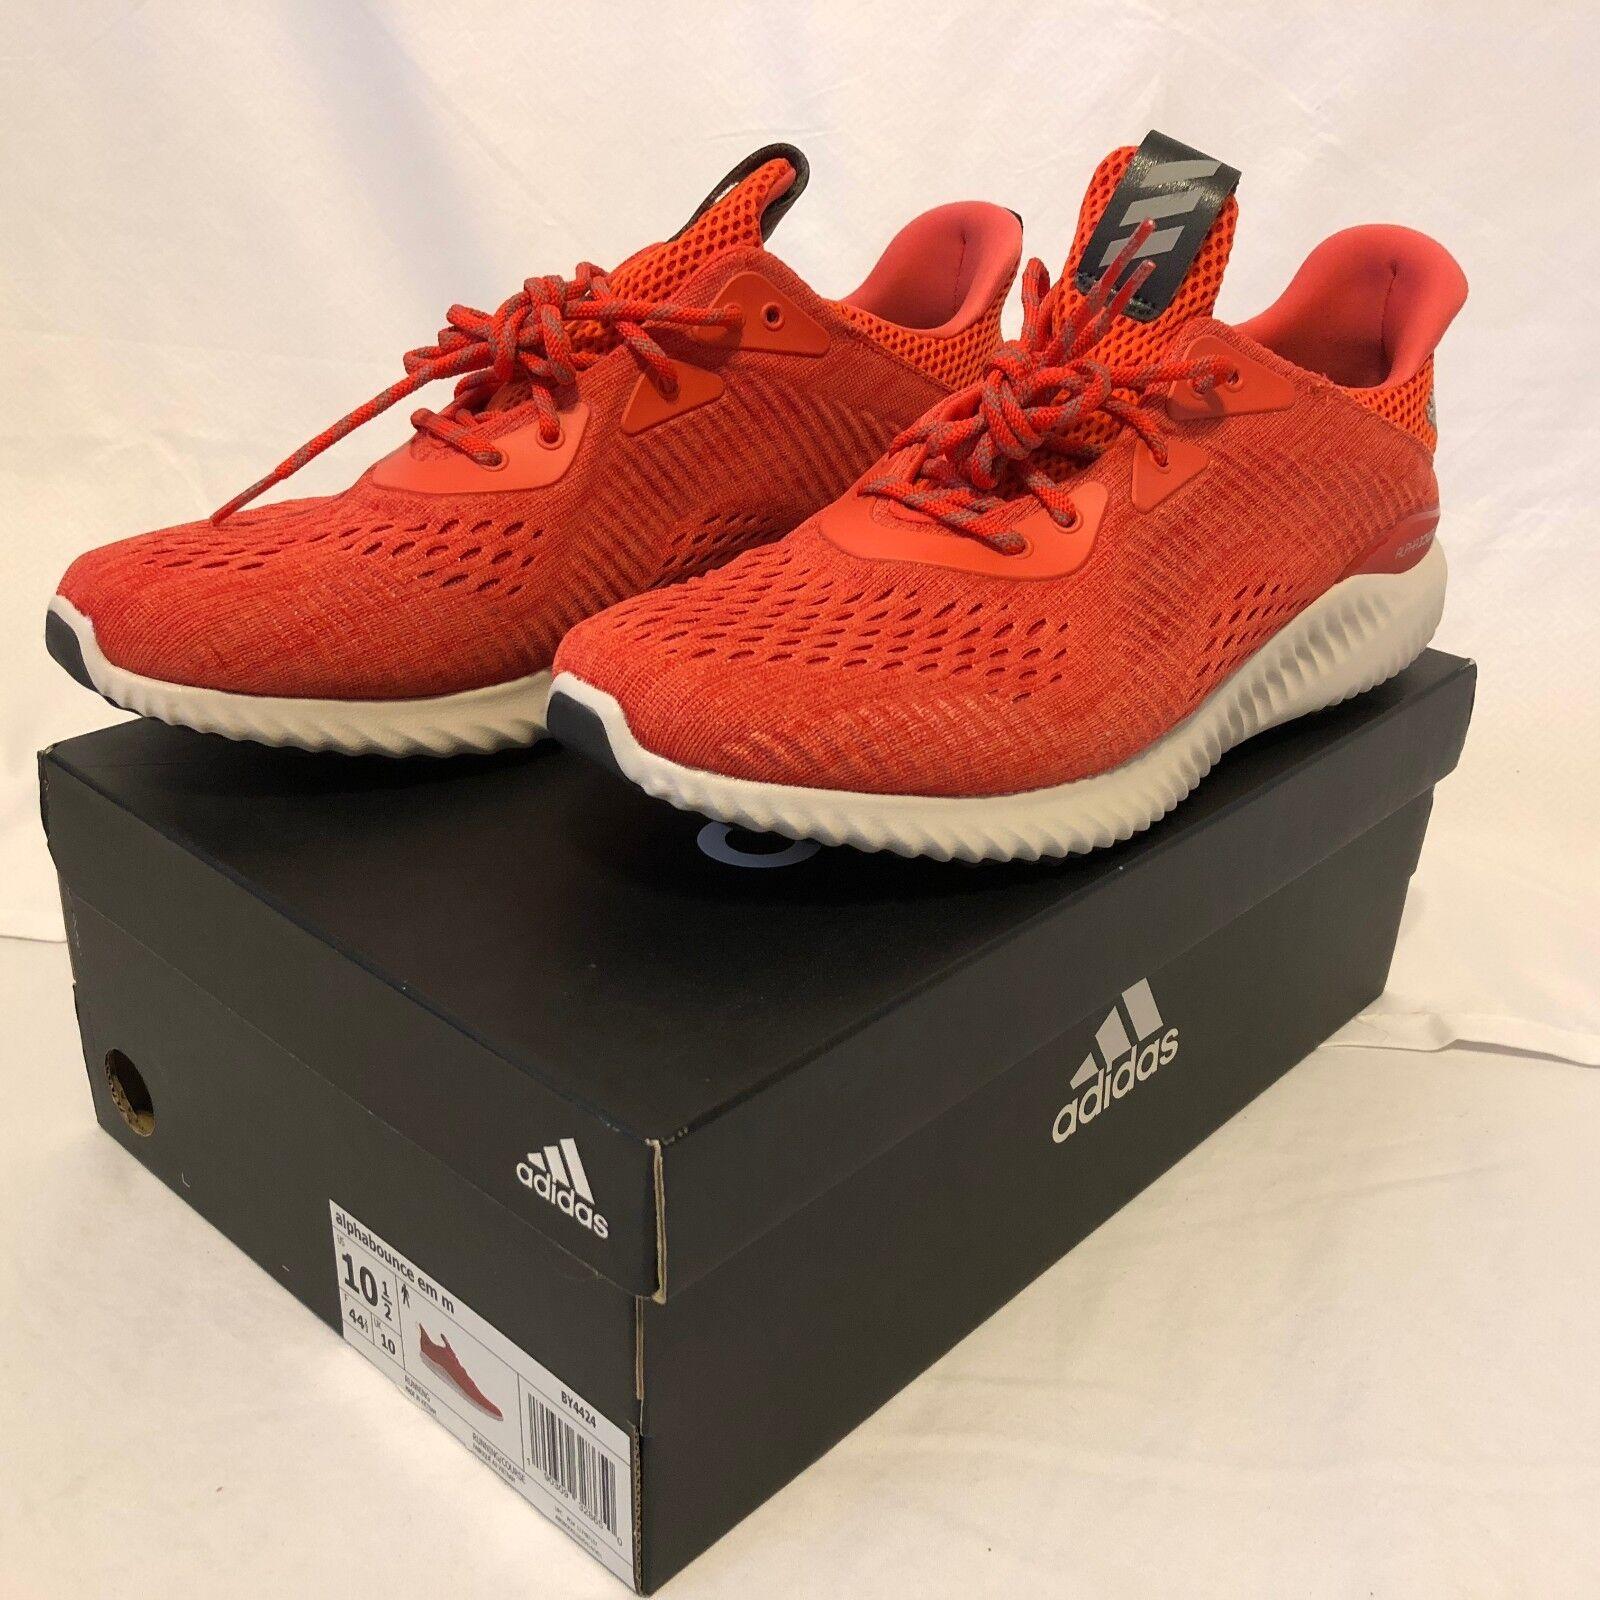 Adidas Men's Alphabounce Em M Blaze orange Red Running shoes Size 10.5 - New